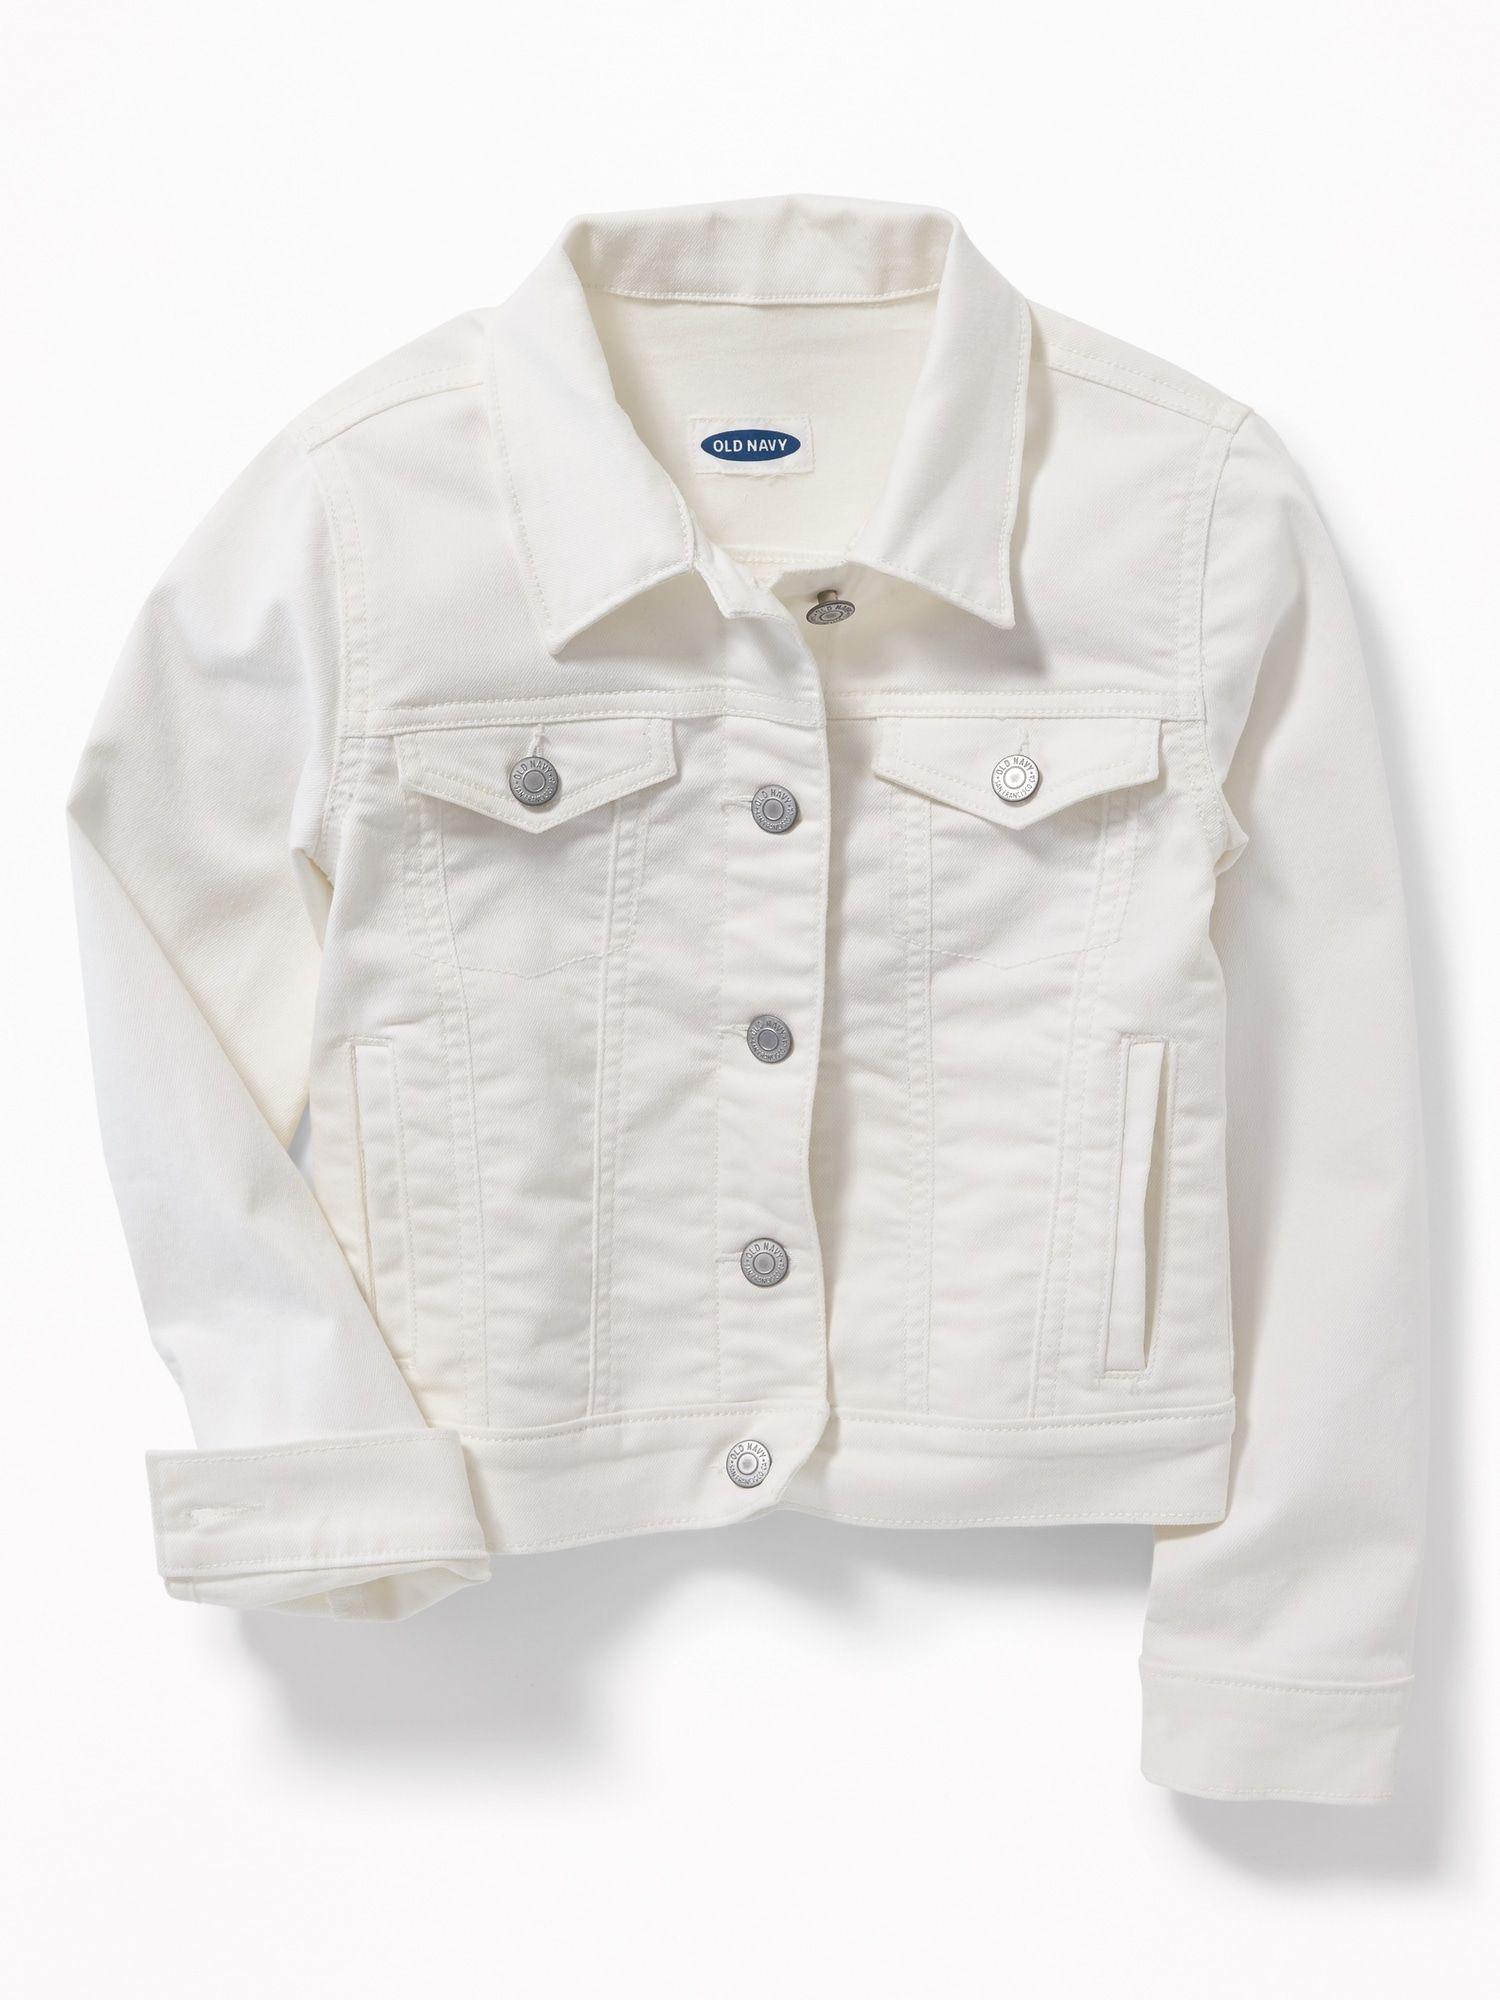 Clean Slate White Denim Jacket For Girls Old Navy White Denim Jacket White Jean Jacket Girls Jacket